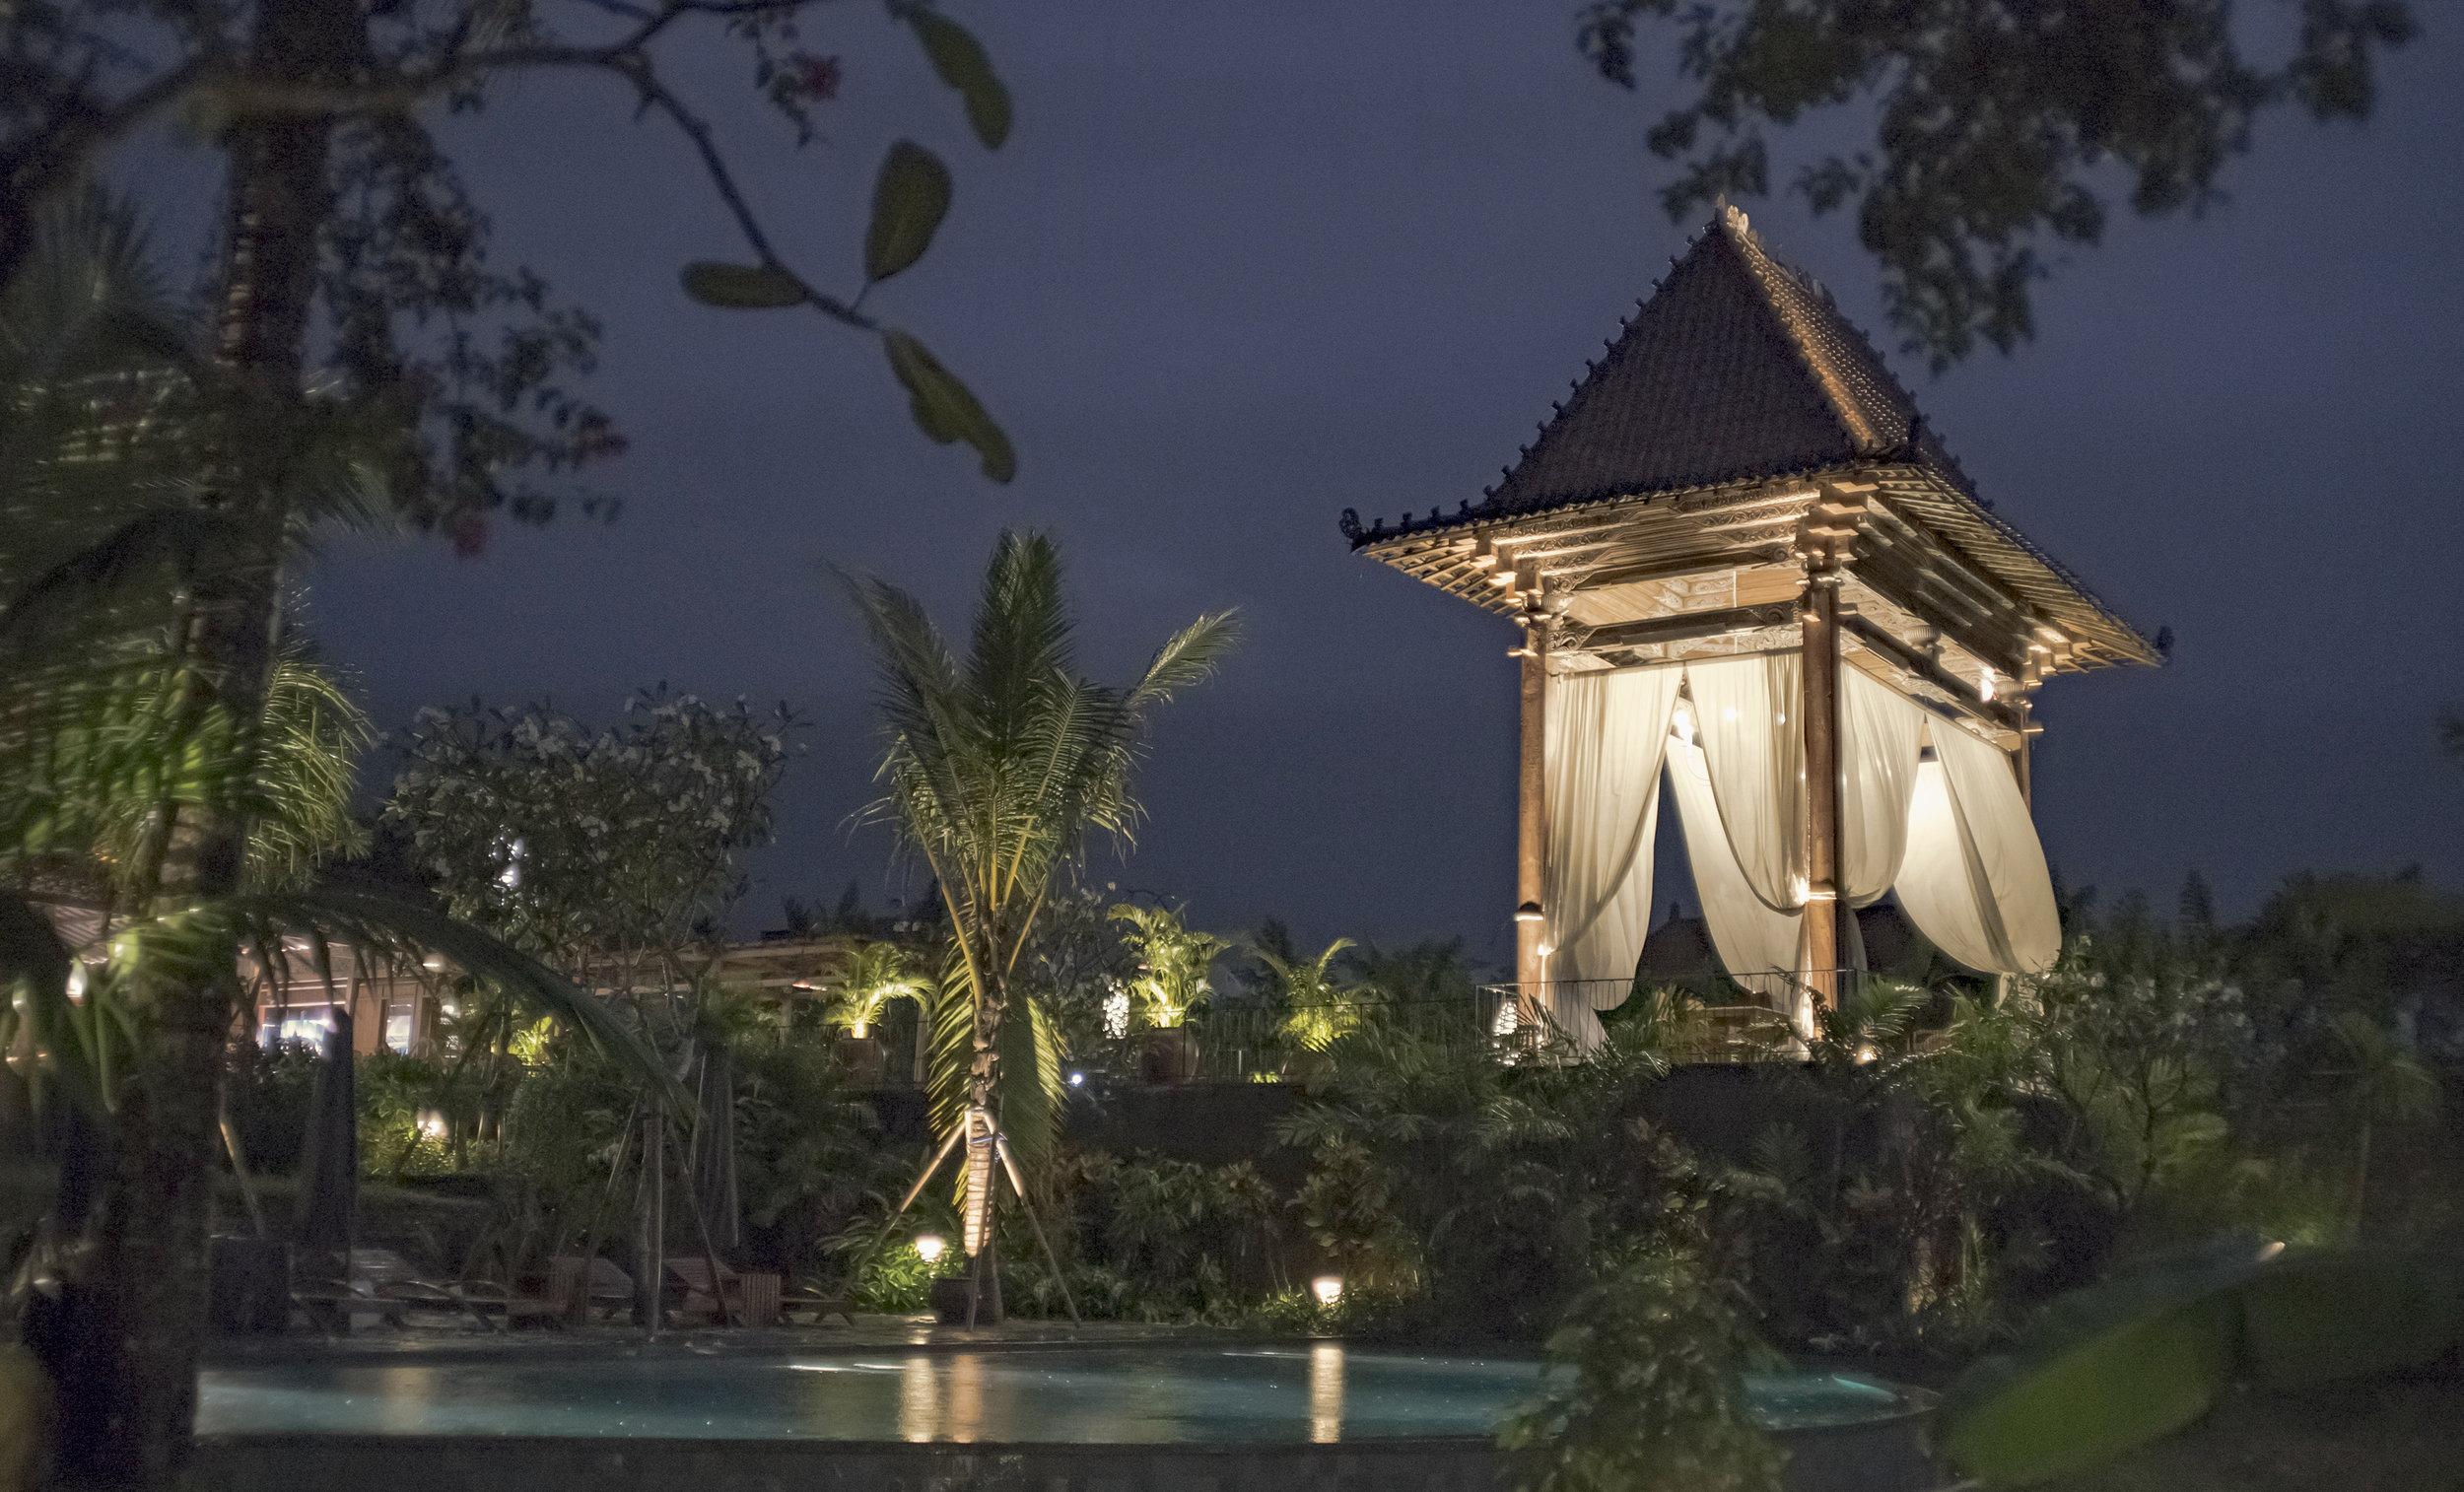 Bali Cabana copy.jpg